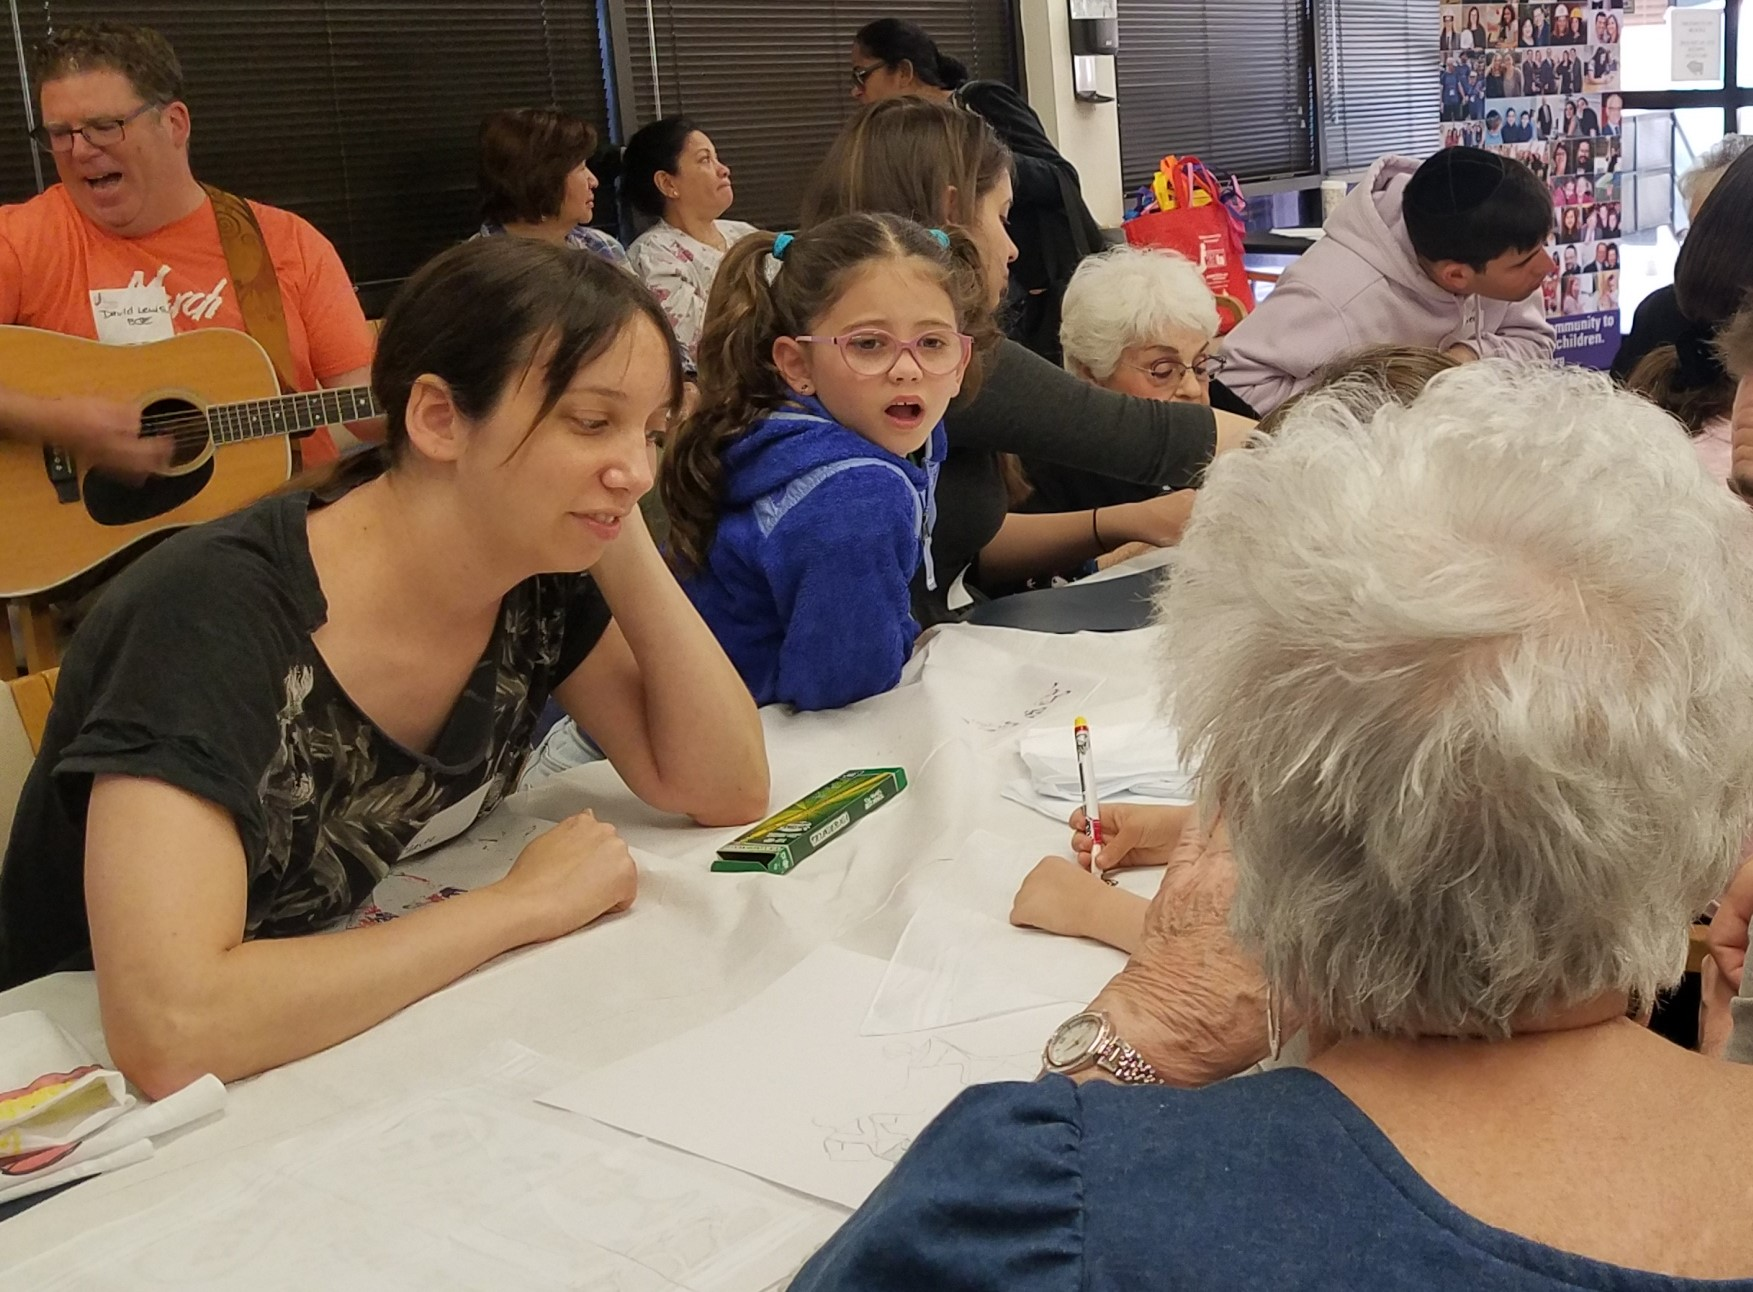 Volunteers and LA Jewish Home residents